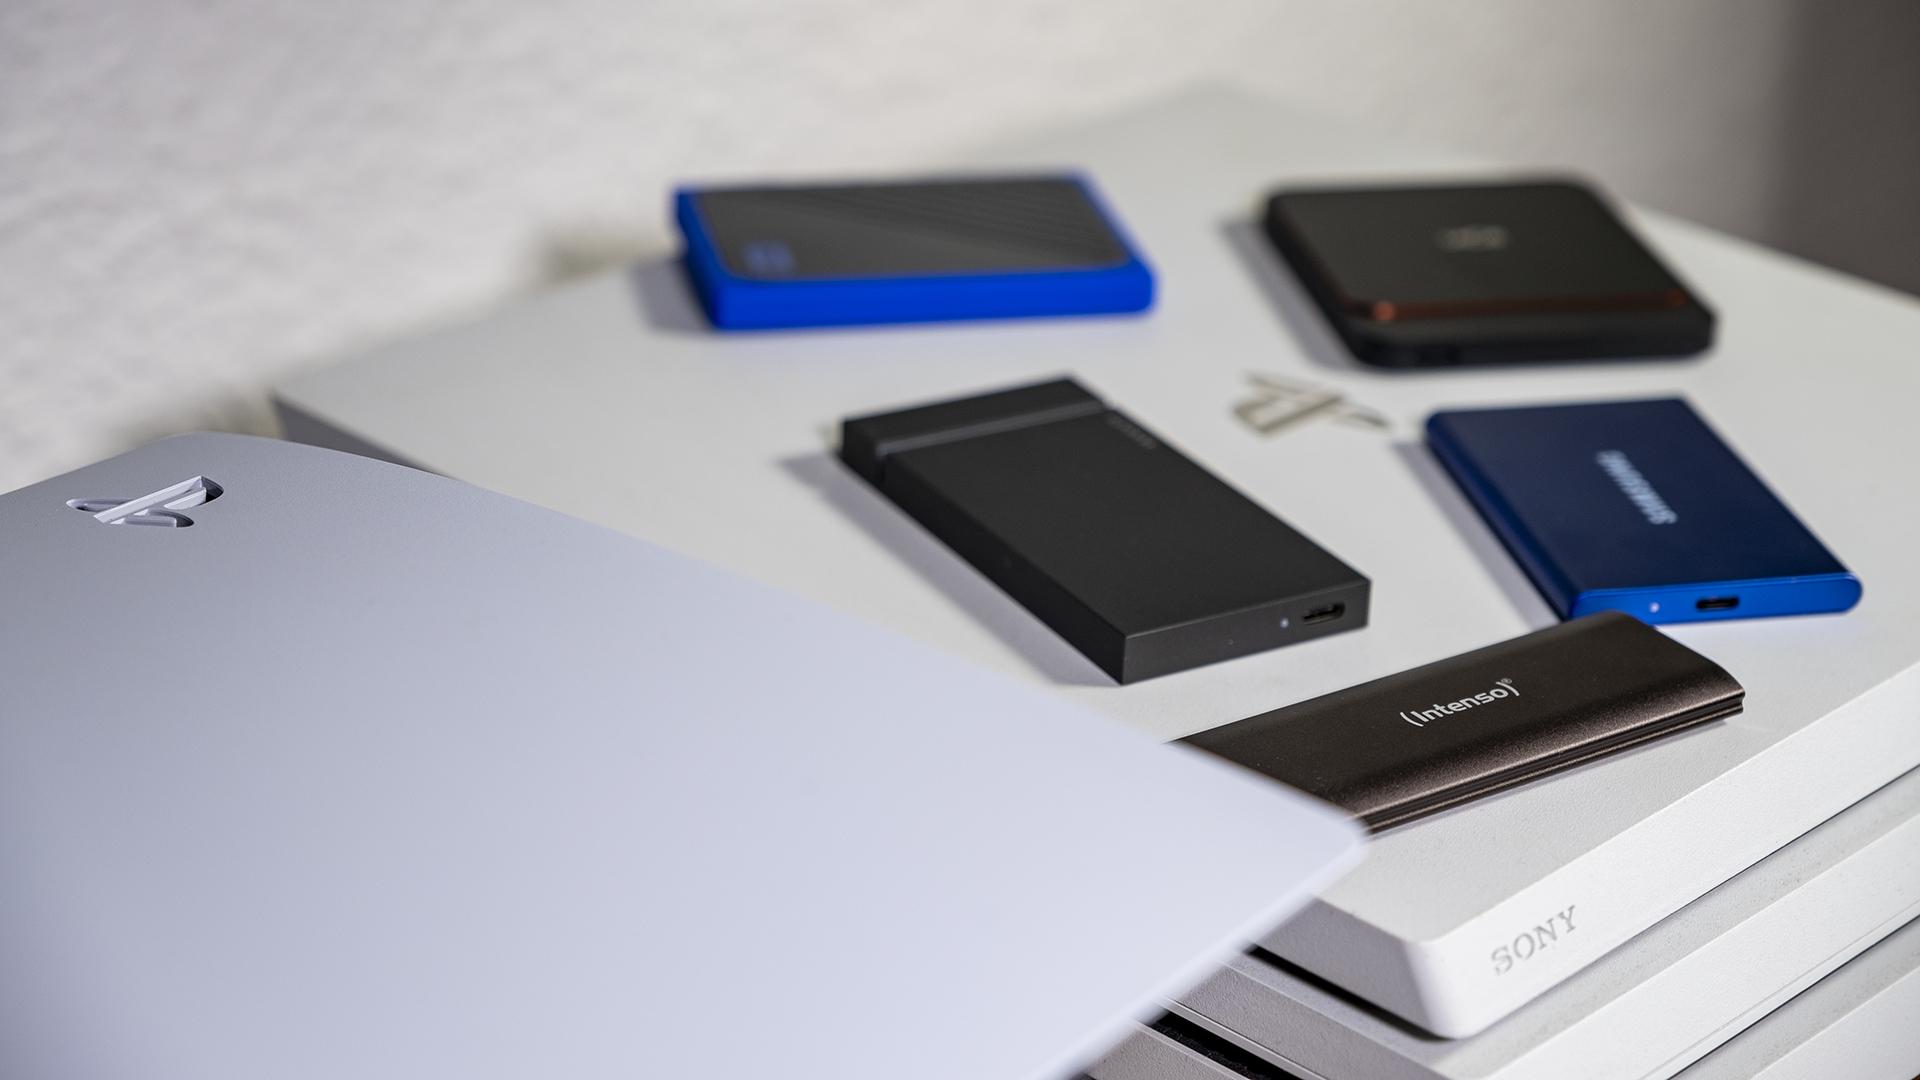 Sony PlayStation 5 Vergleich externe SSDs Comparison external SSDs USB